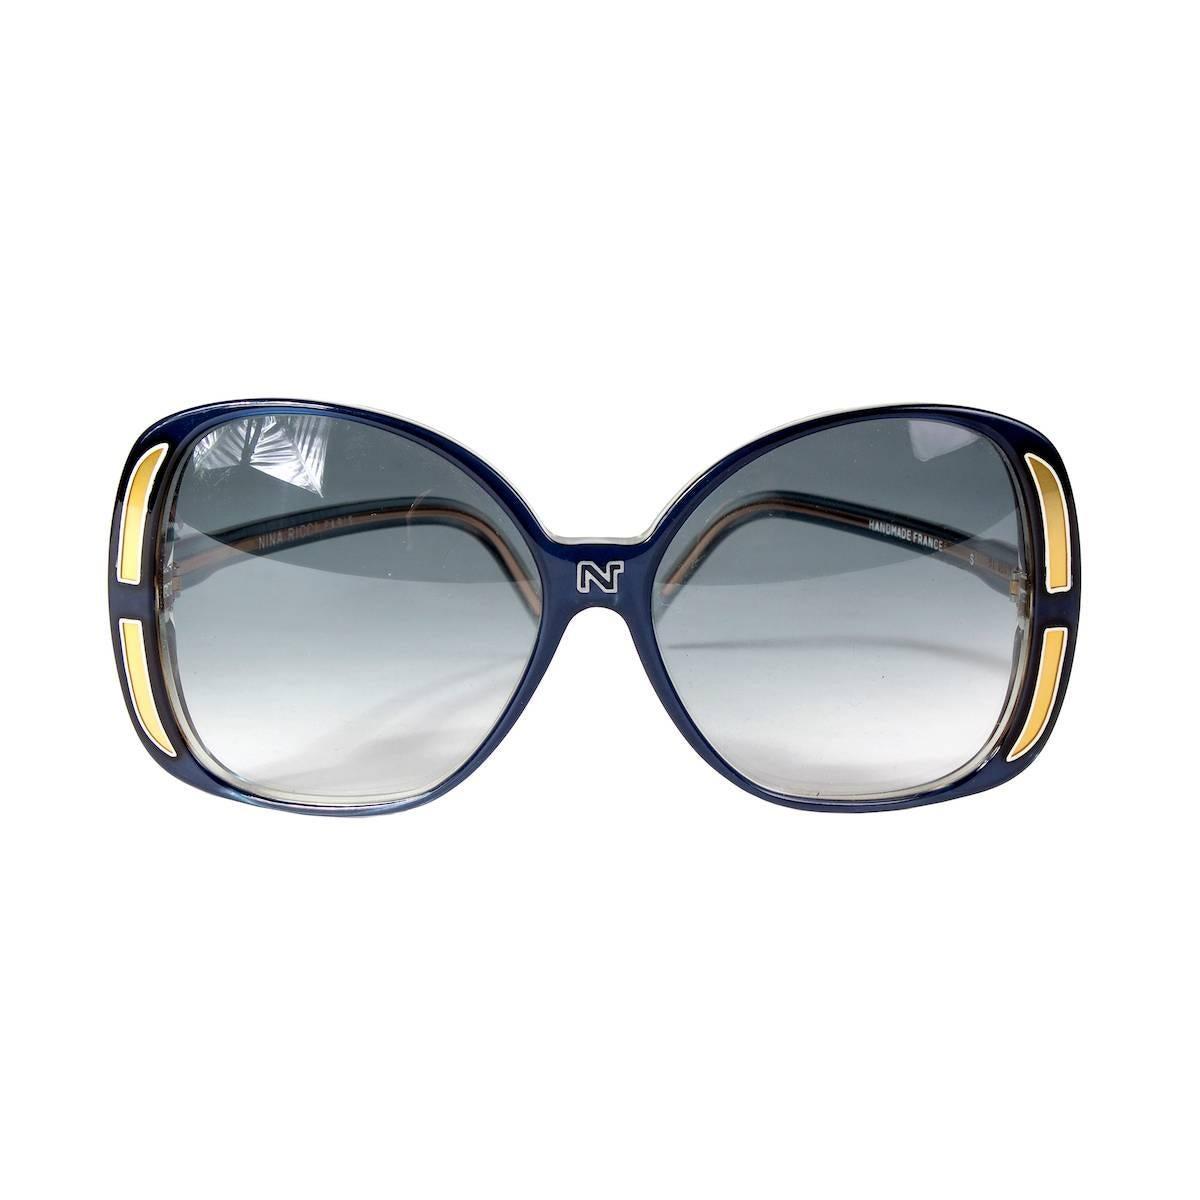 1ff27c5626 Vintage Nina Ricci Sunglasses - 6 For Sale at 1stdibs